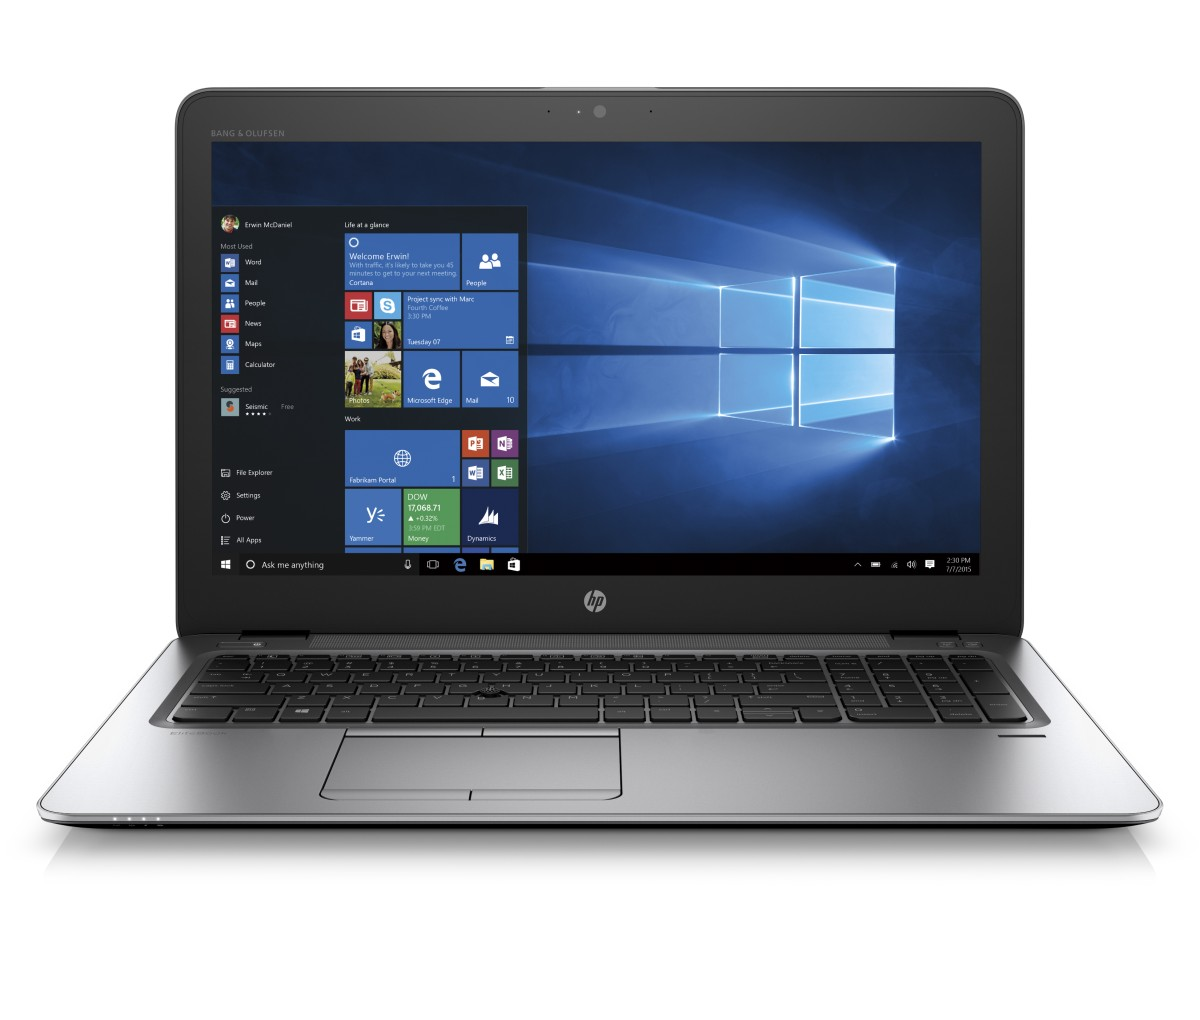 HP EliteBook 850 G4 15.6 FHD/i7-7500U/16GB/512SSD/ATI/4G/WIFI/BT/MCR/FPR/3RServis/W10P